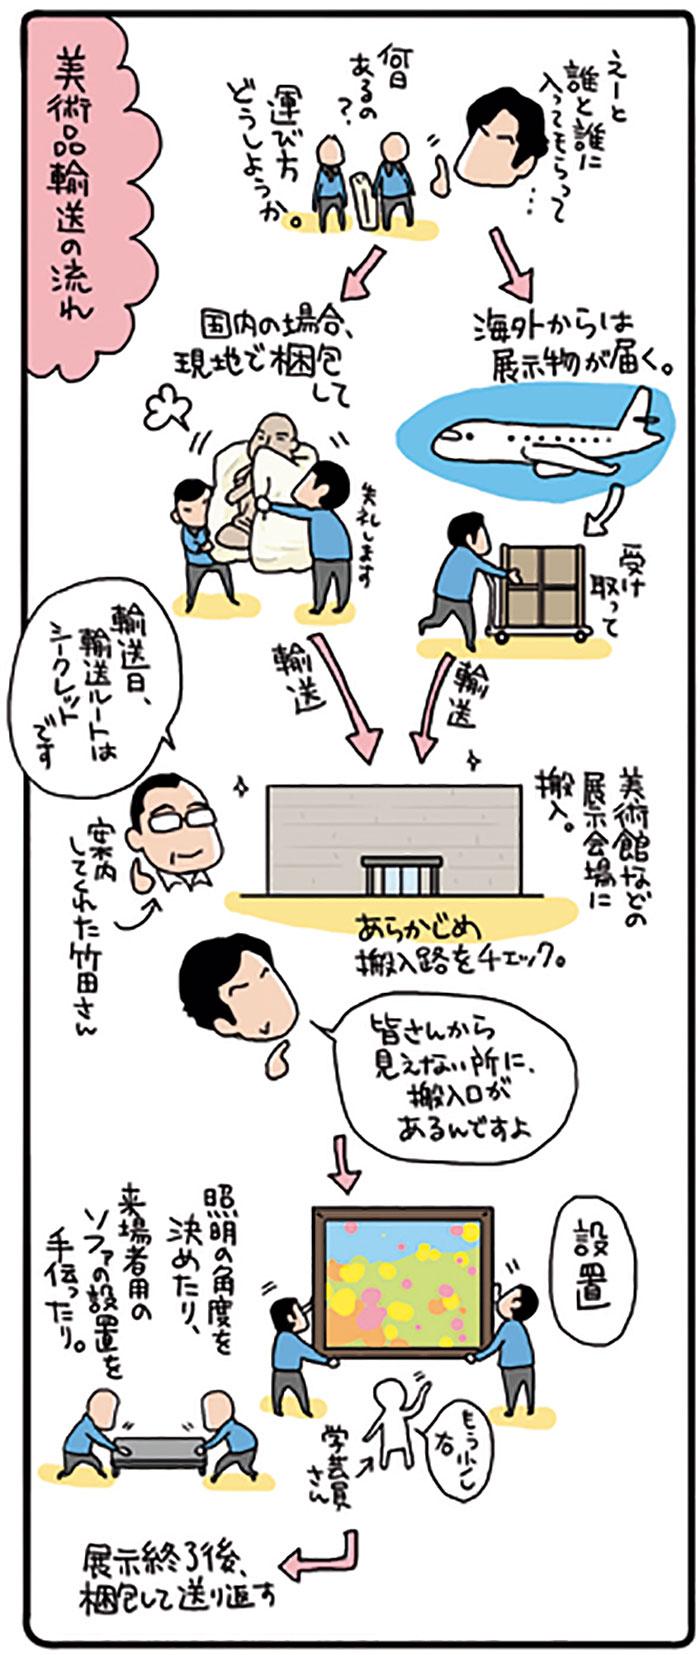 画像02_2